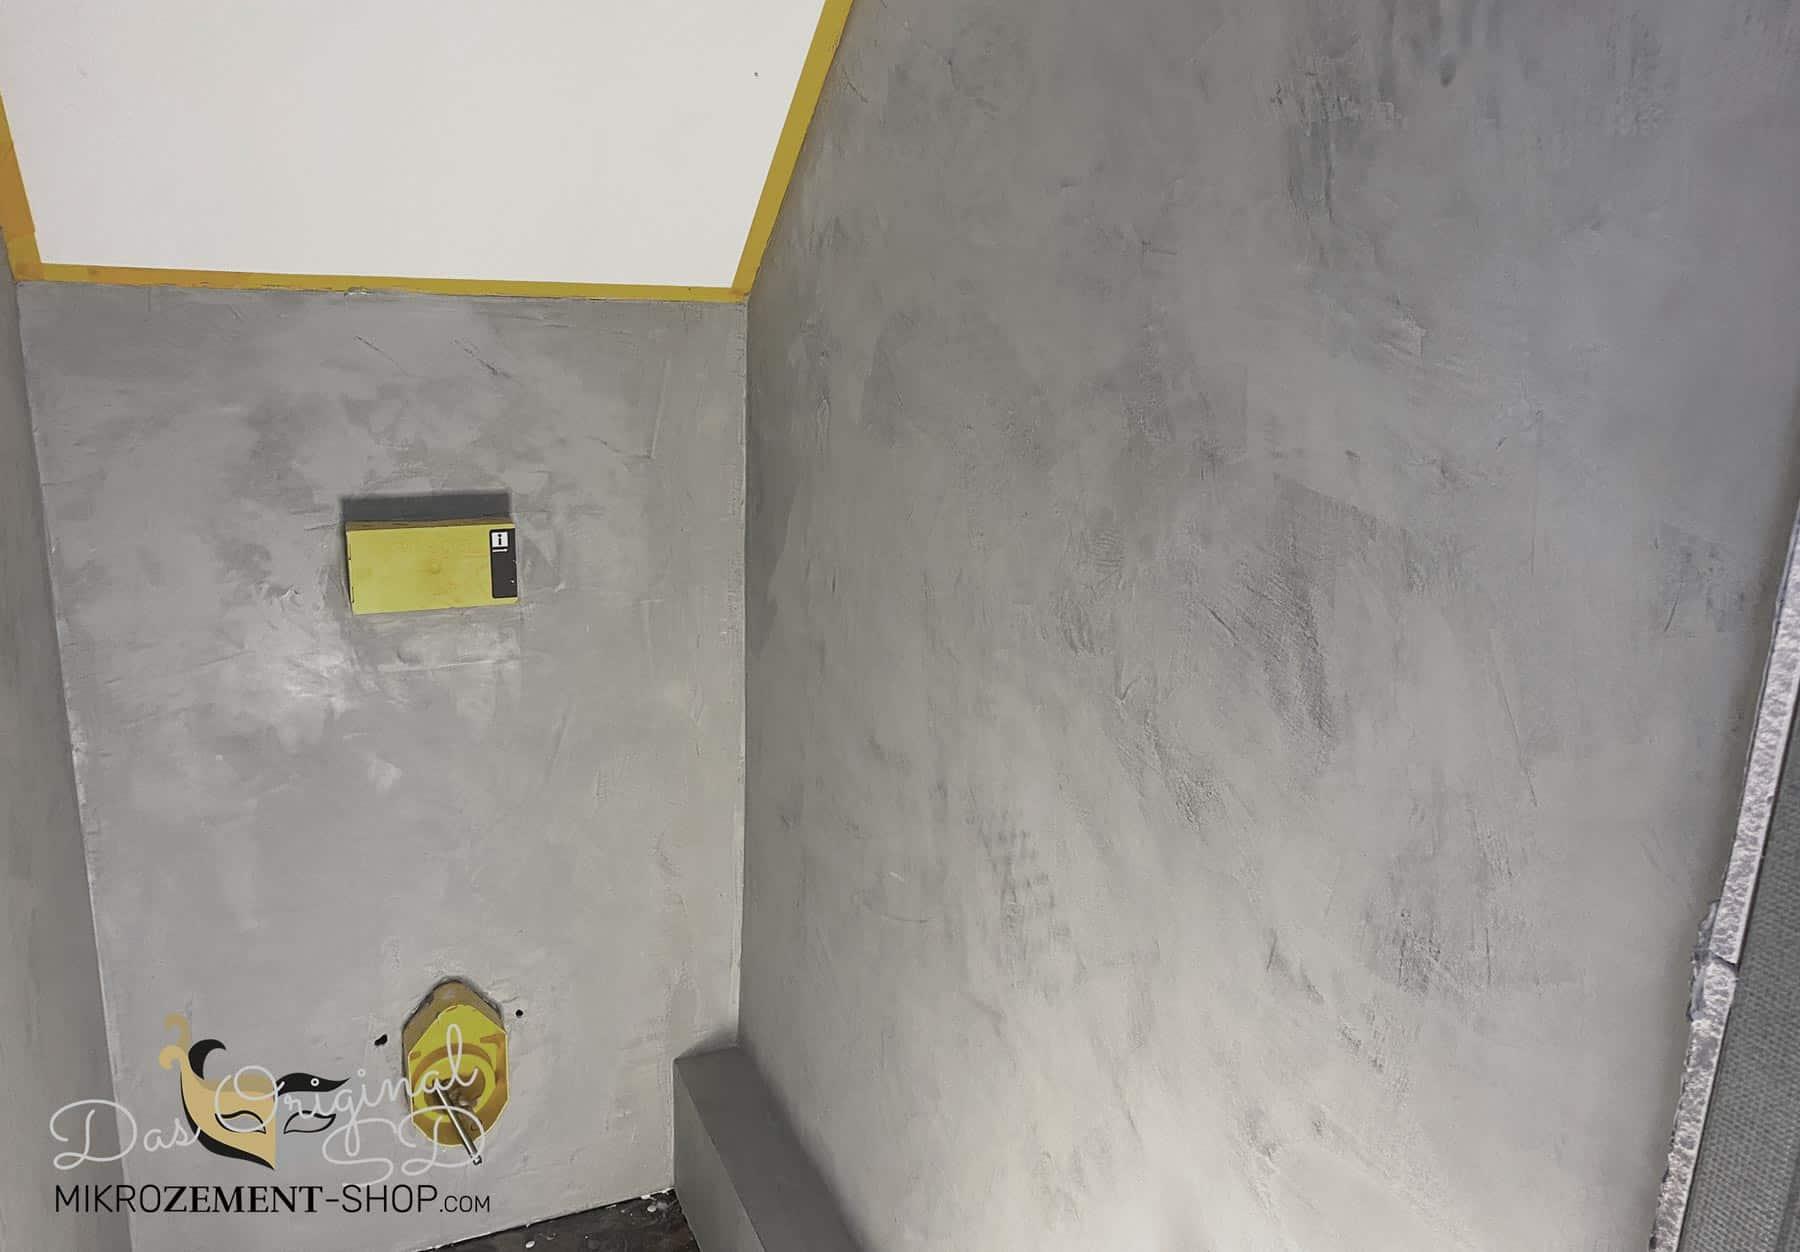 Microzement Mikrozement WC grau Wand